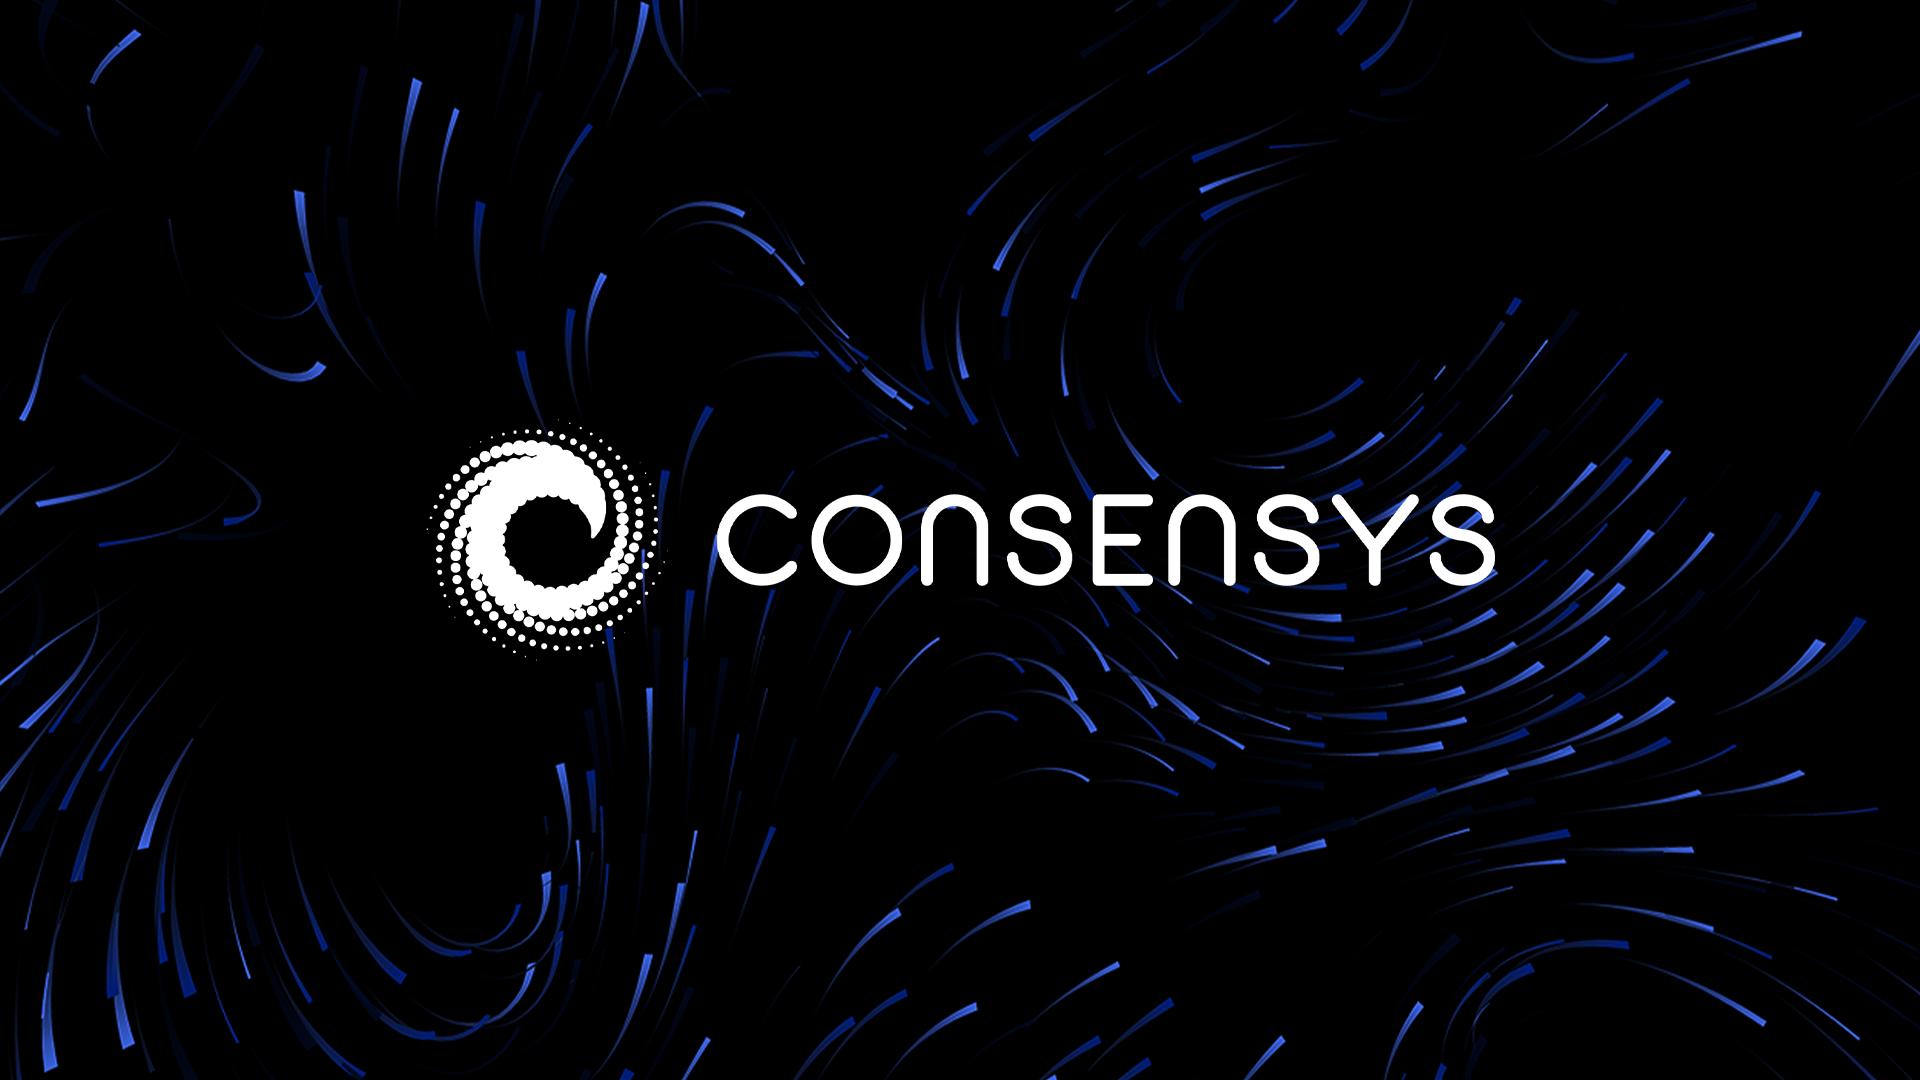 ConsenSys Acquires Quorum® Platform from J.P. Morgan